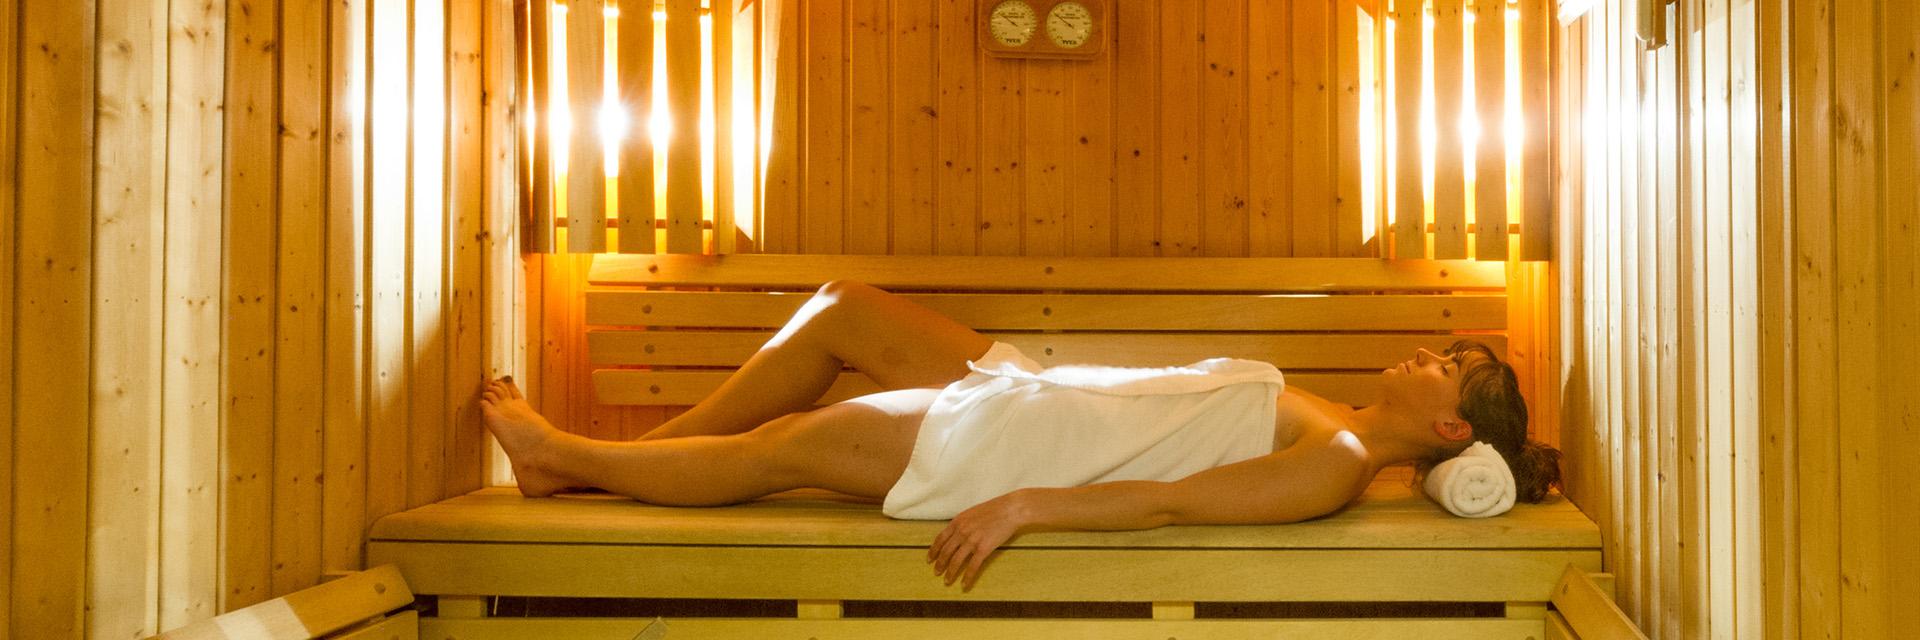 Village_club_vacances_haute-savoie_Auberge-Nordique-sauna